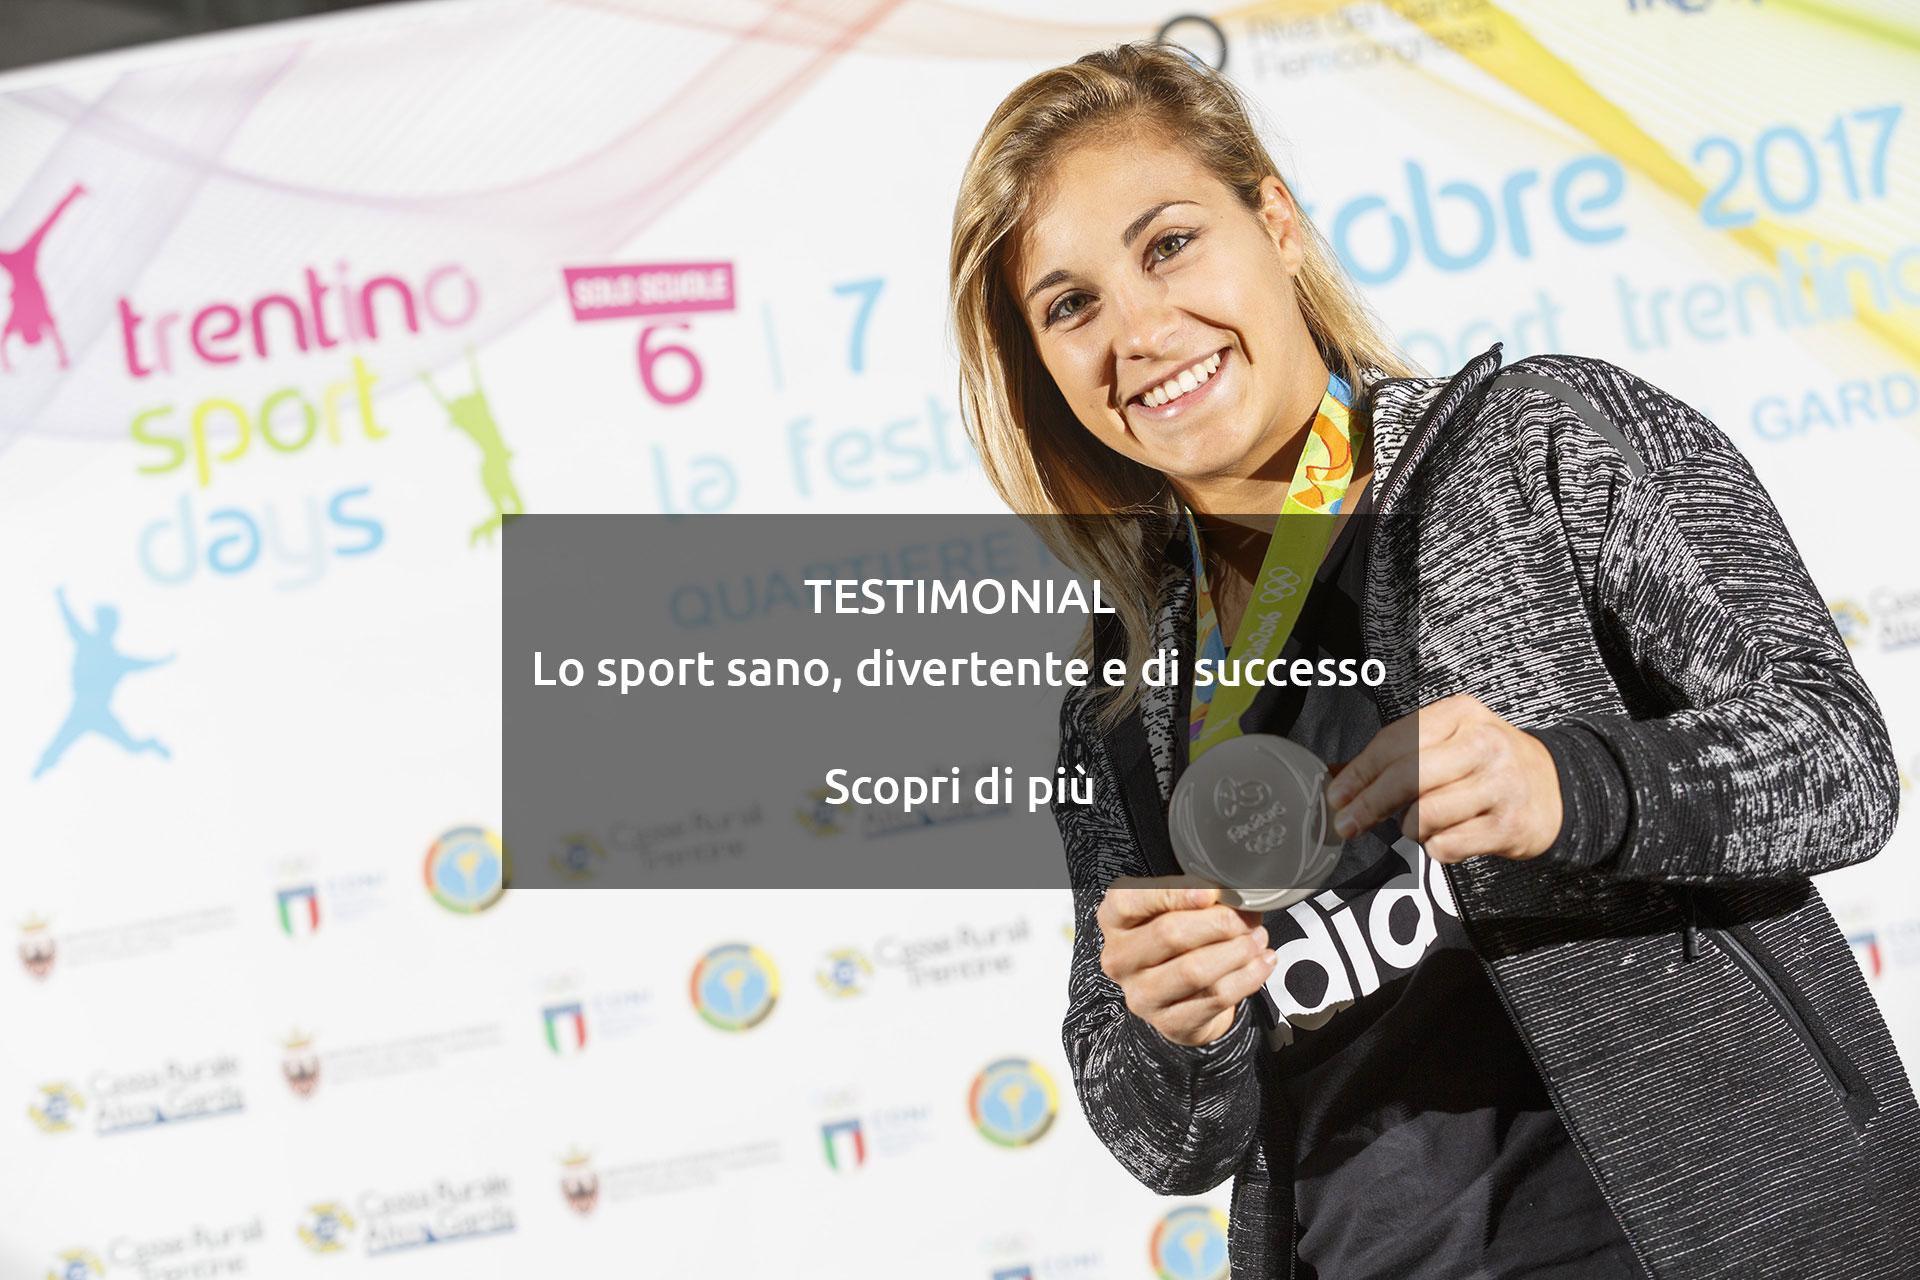 Trentino-Sport-Days-testimonial.JPG